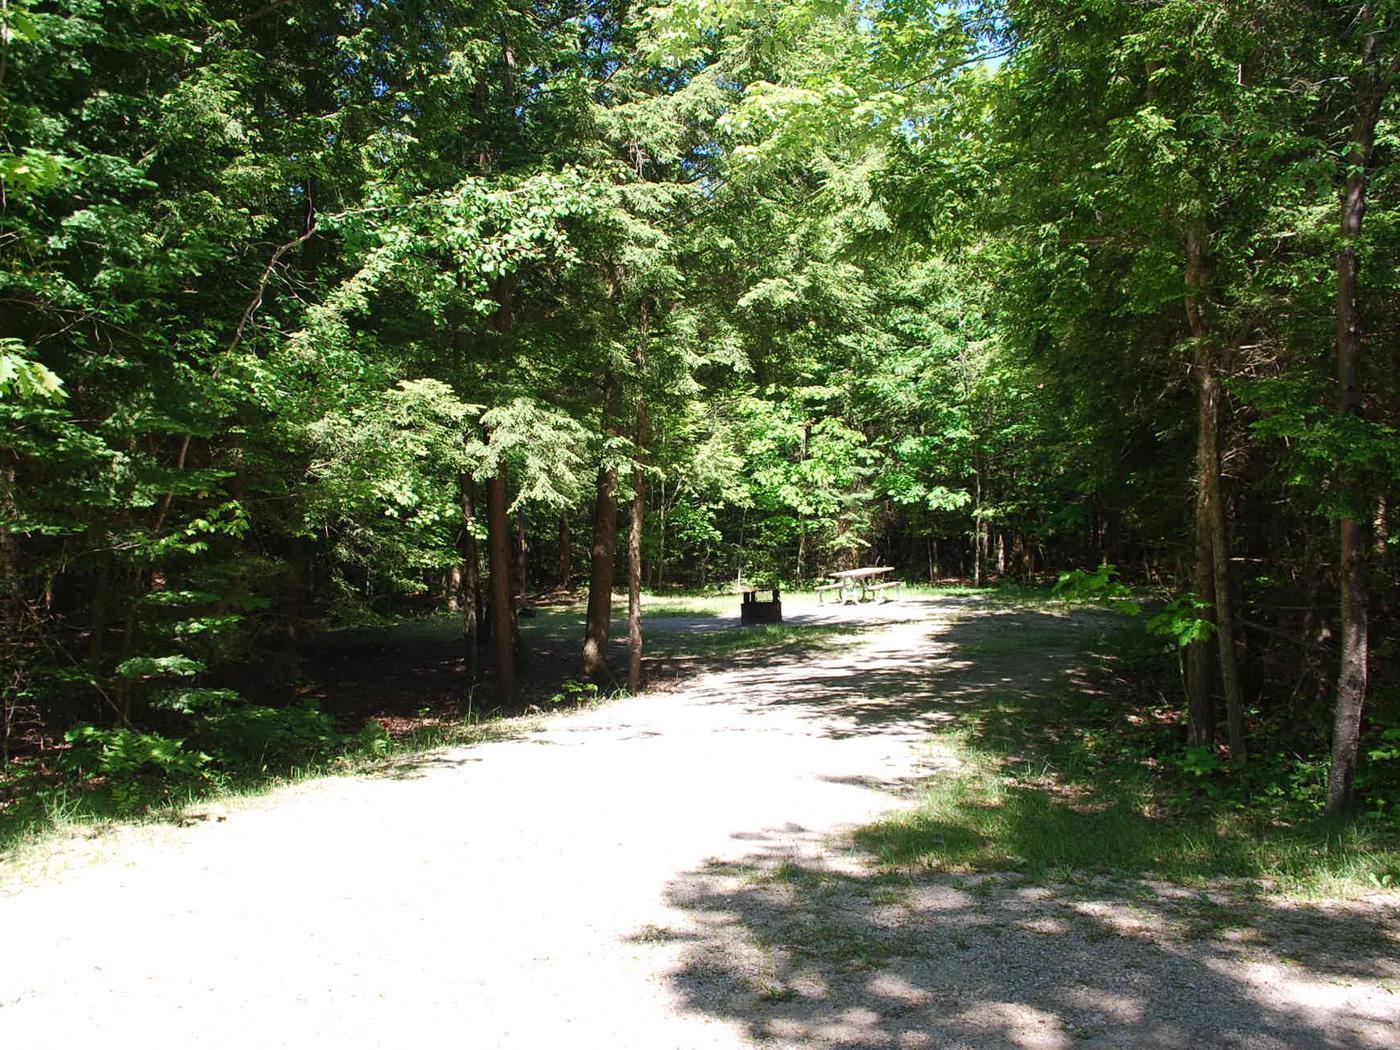 Little Bay de Noc Campground site #13